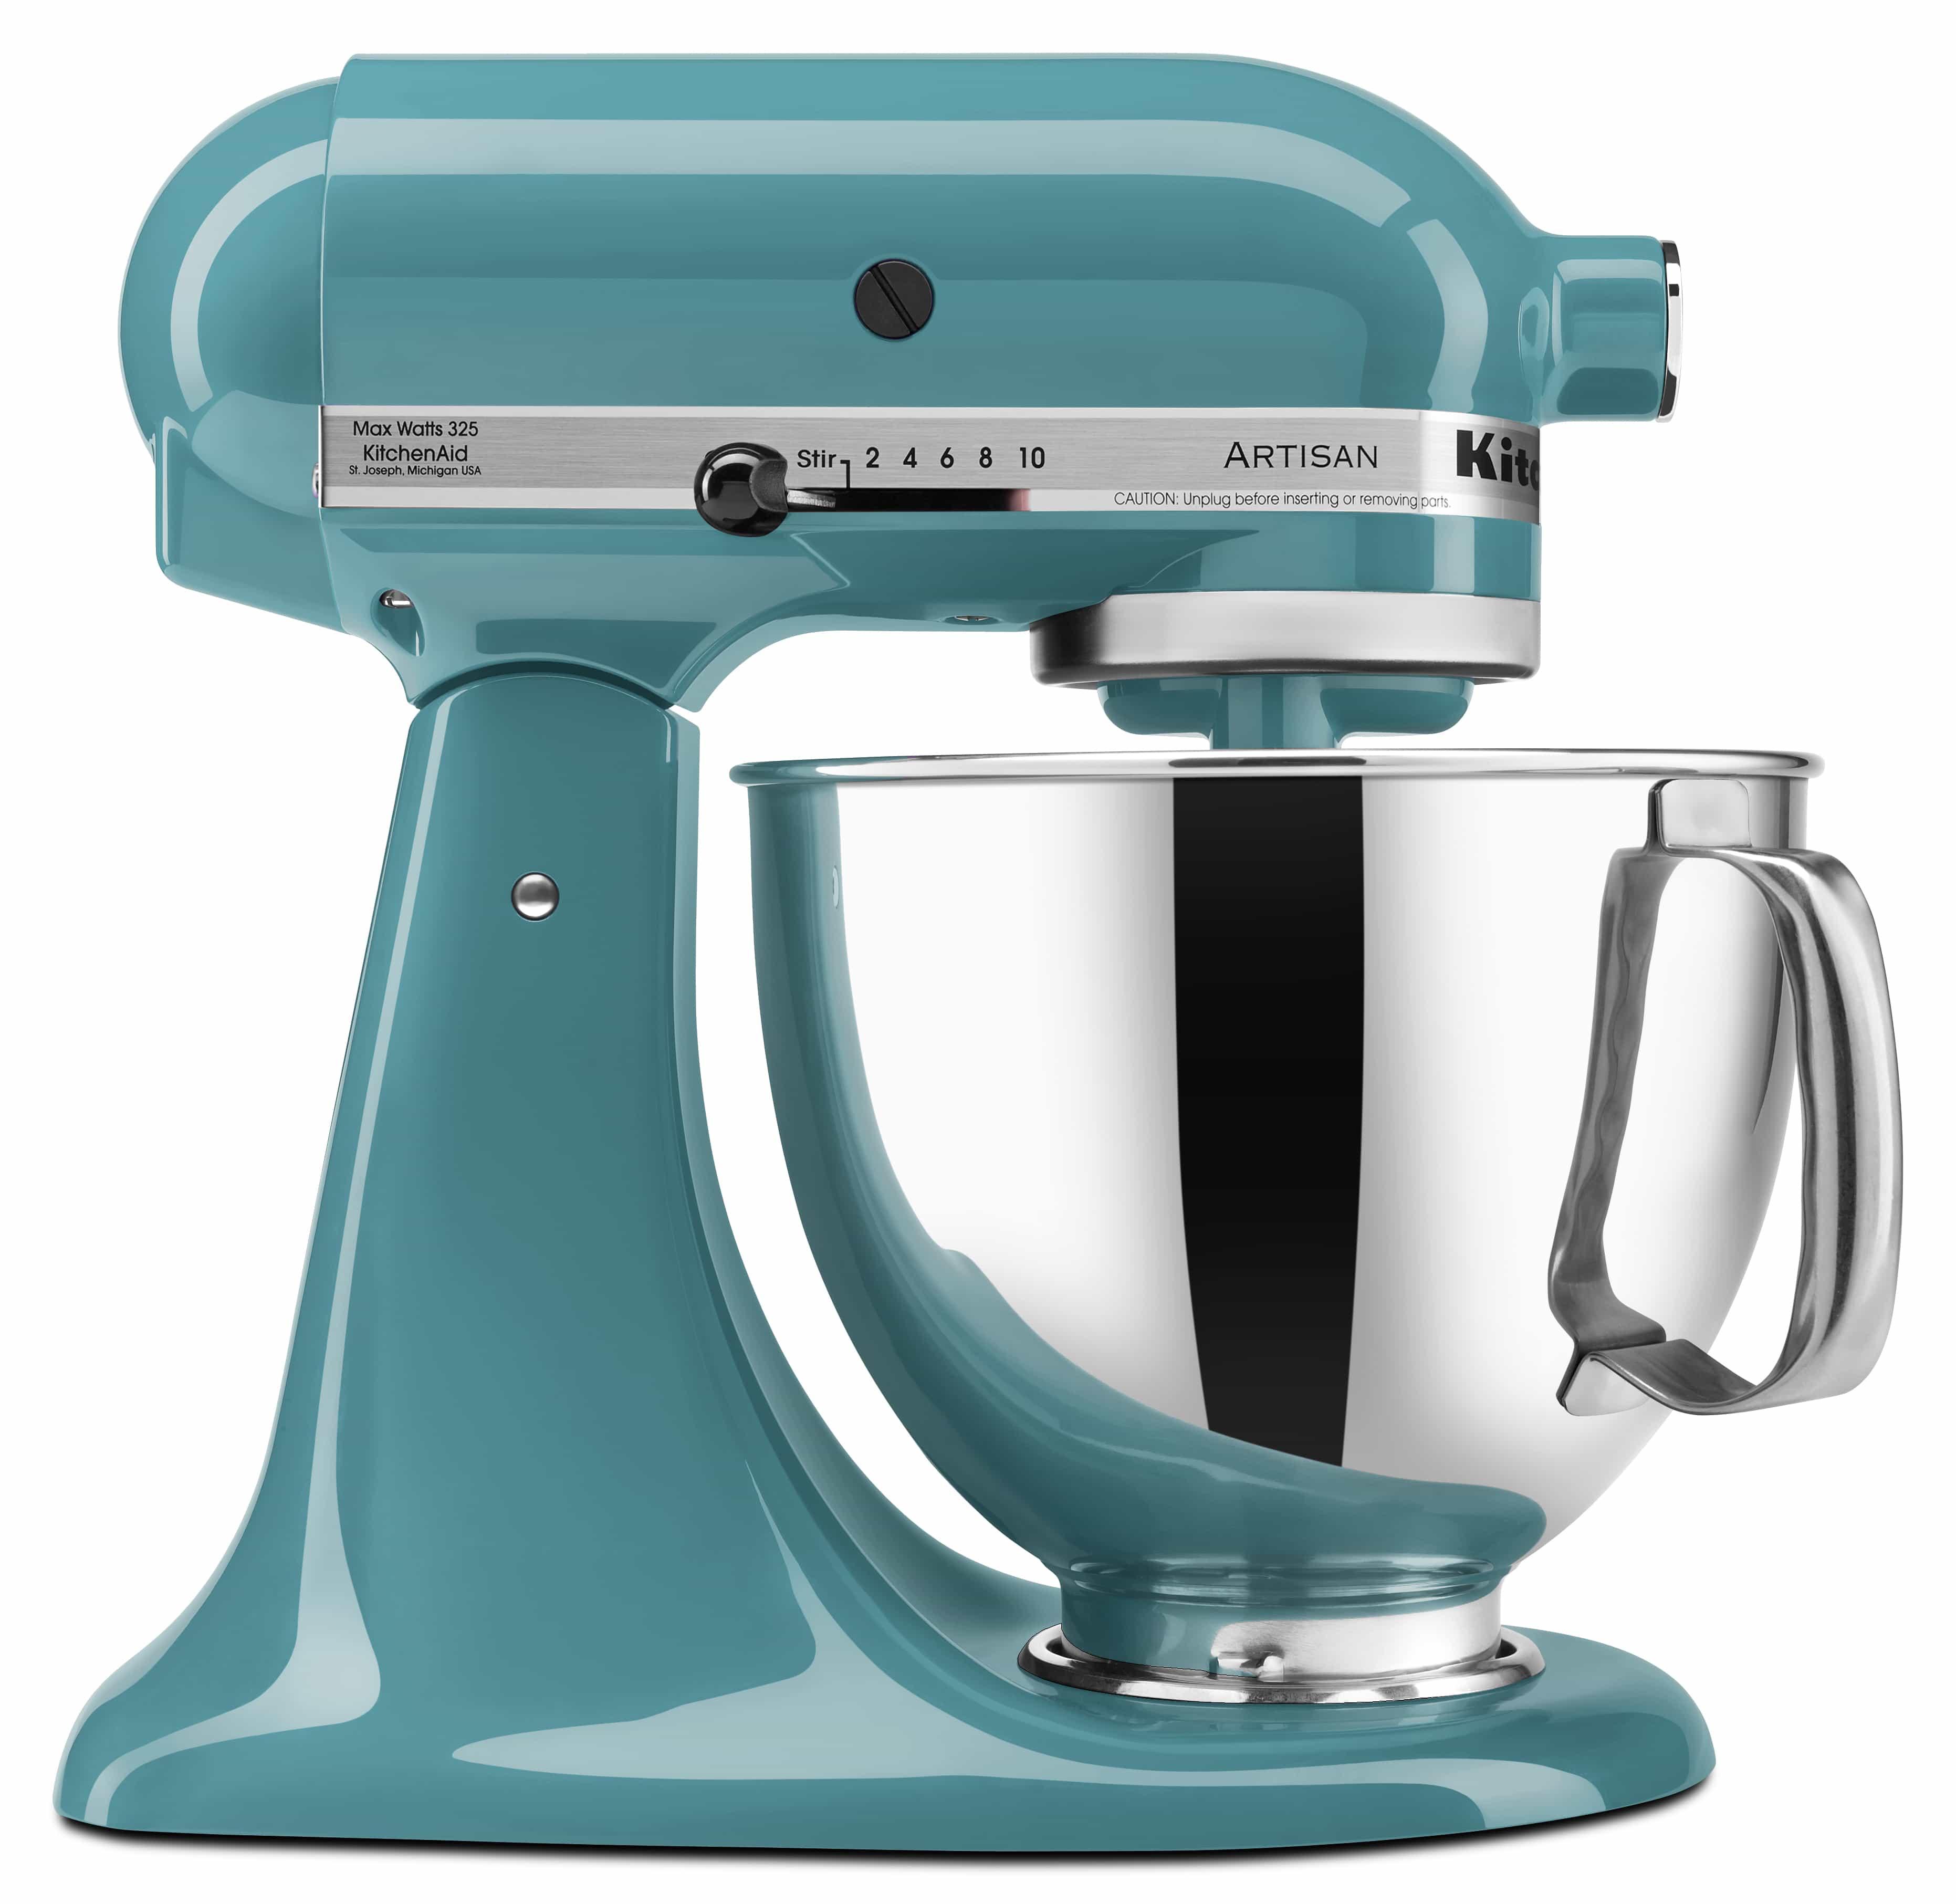 kitchen aid classic plus industrial cabinets compare kitchenaid vs artisan stand mixer 2019